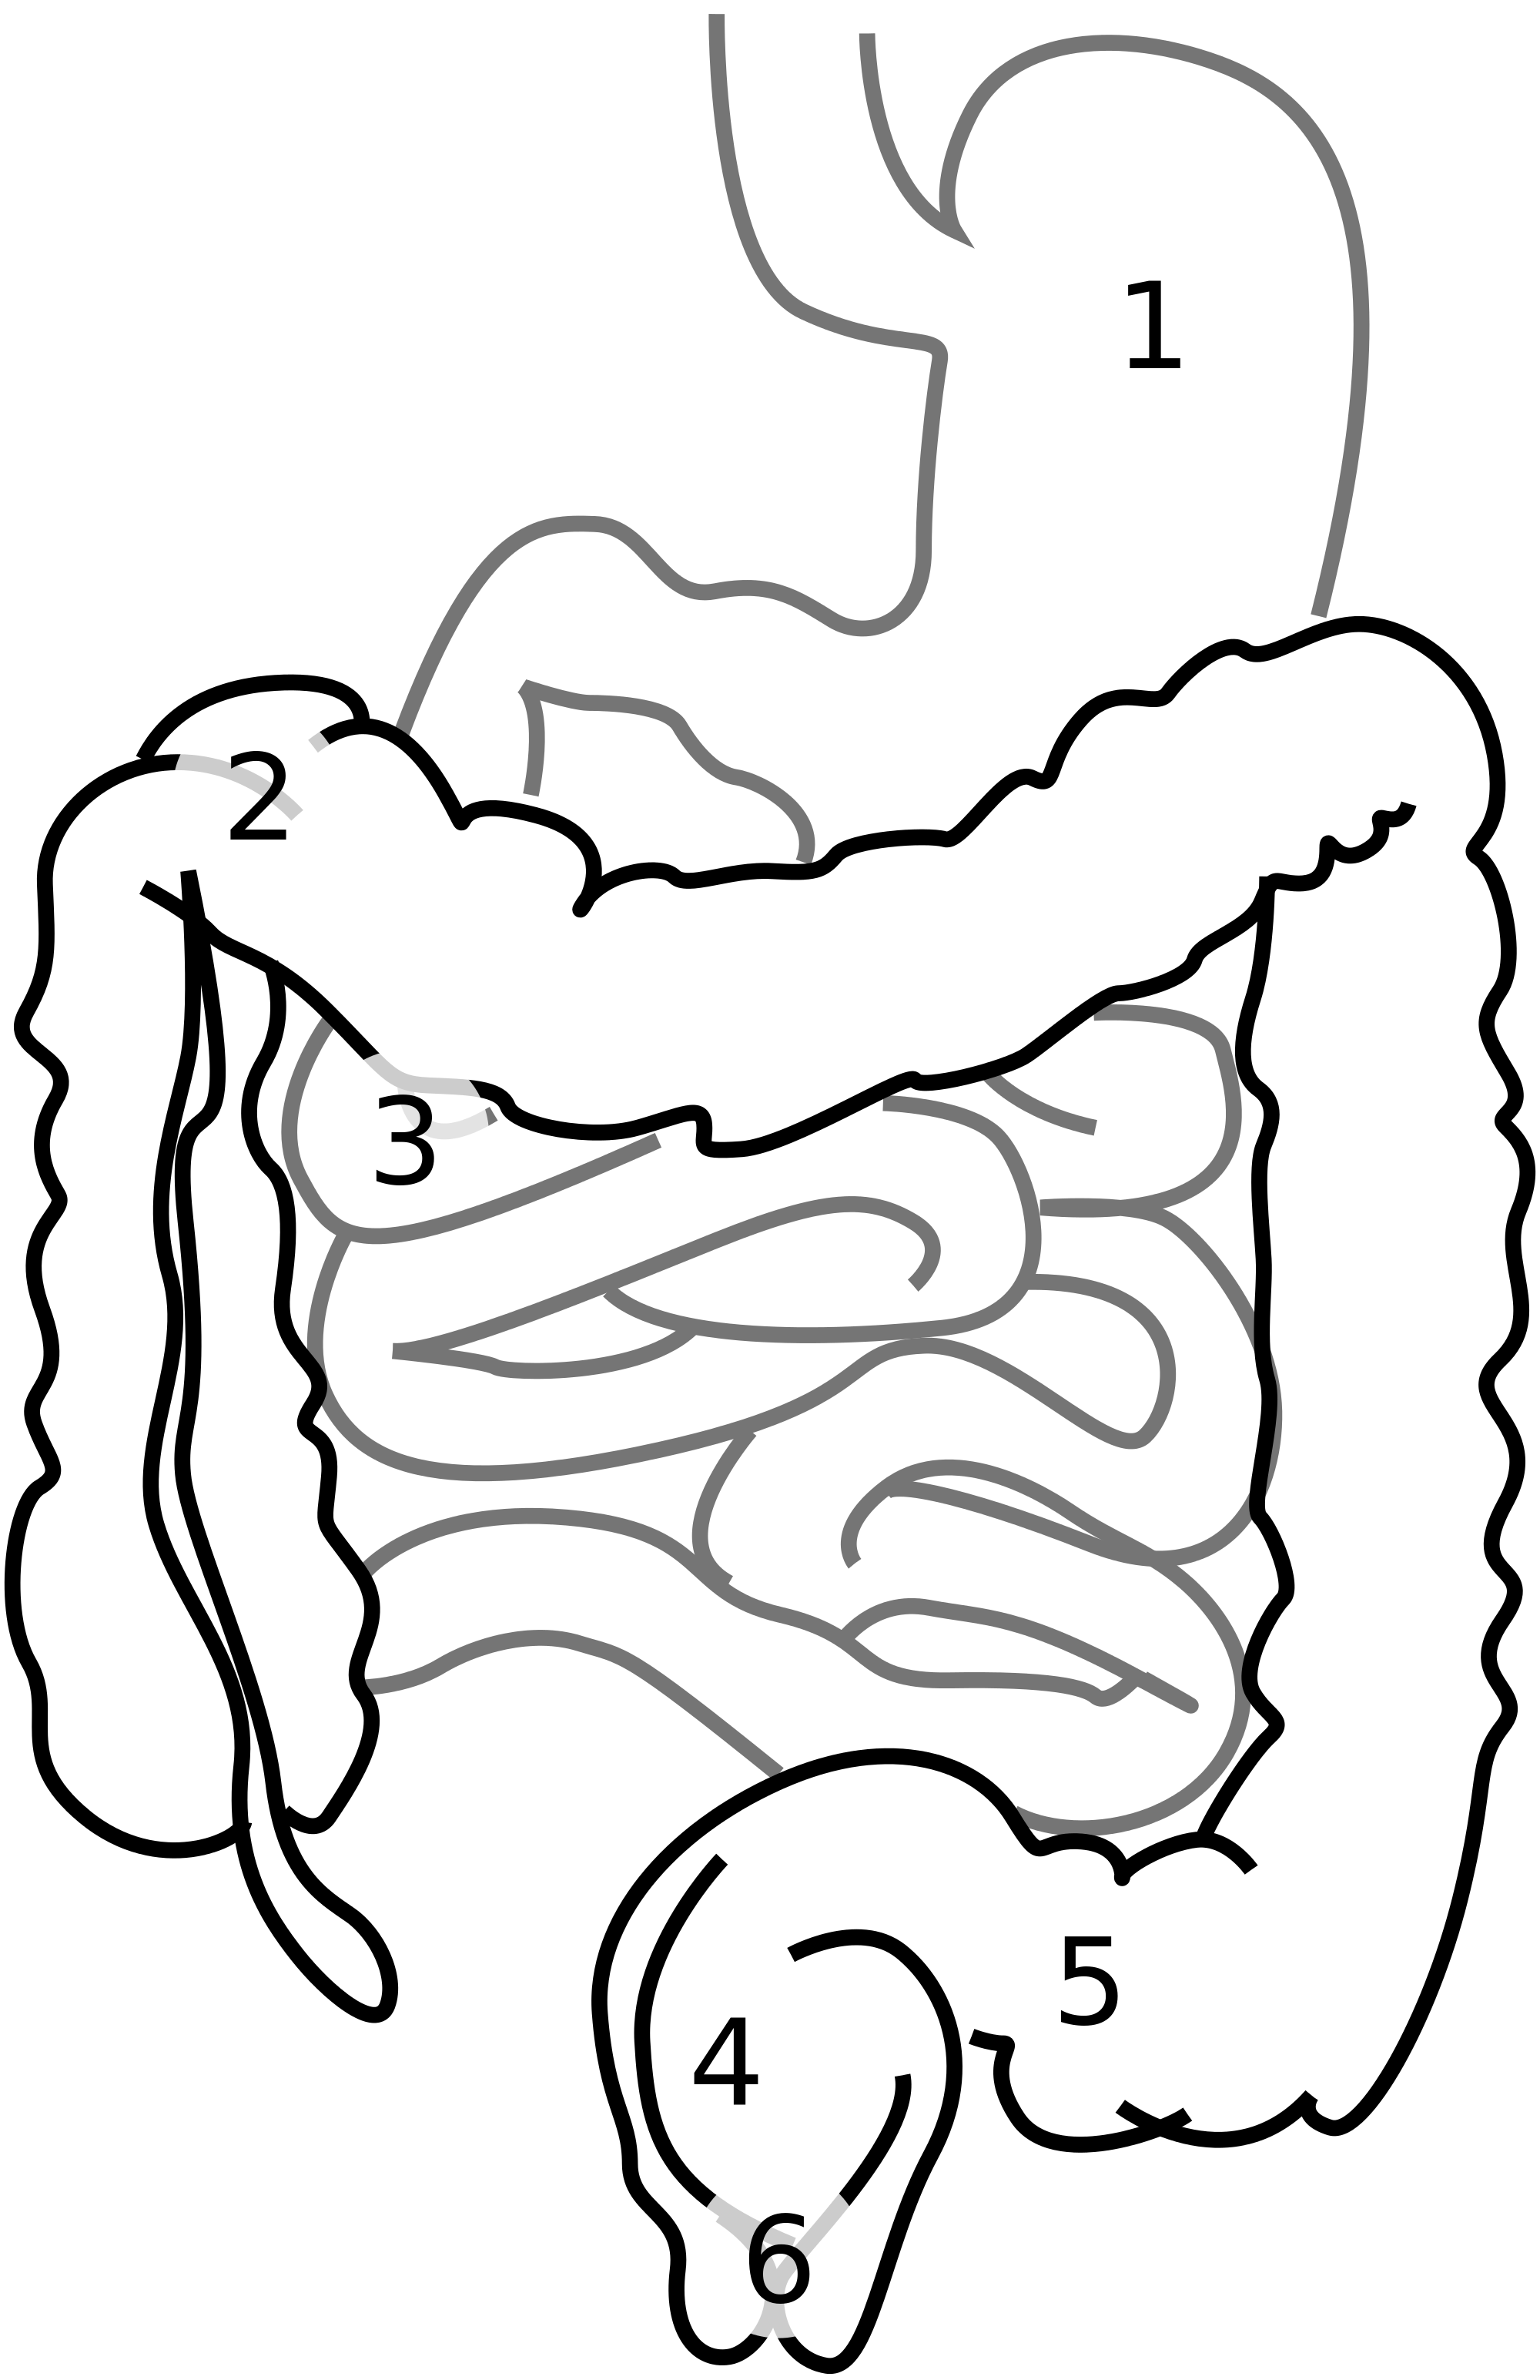 2000x3090 Fileintestine Diagram Num.svg